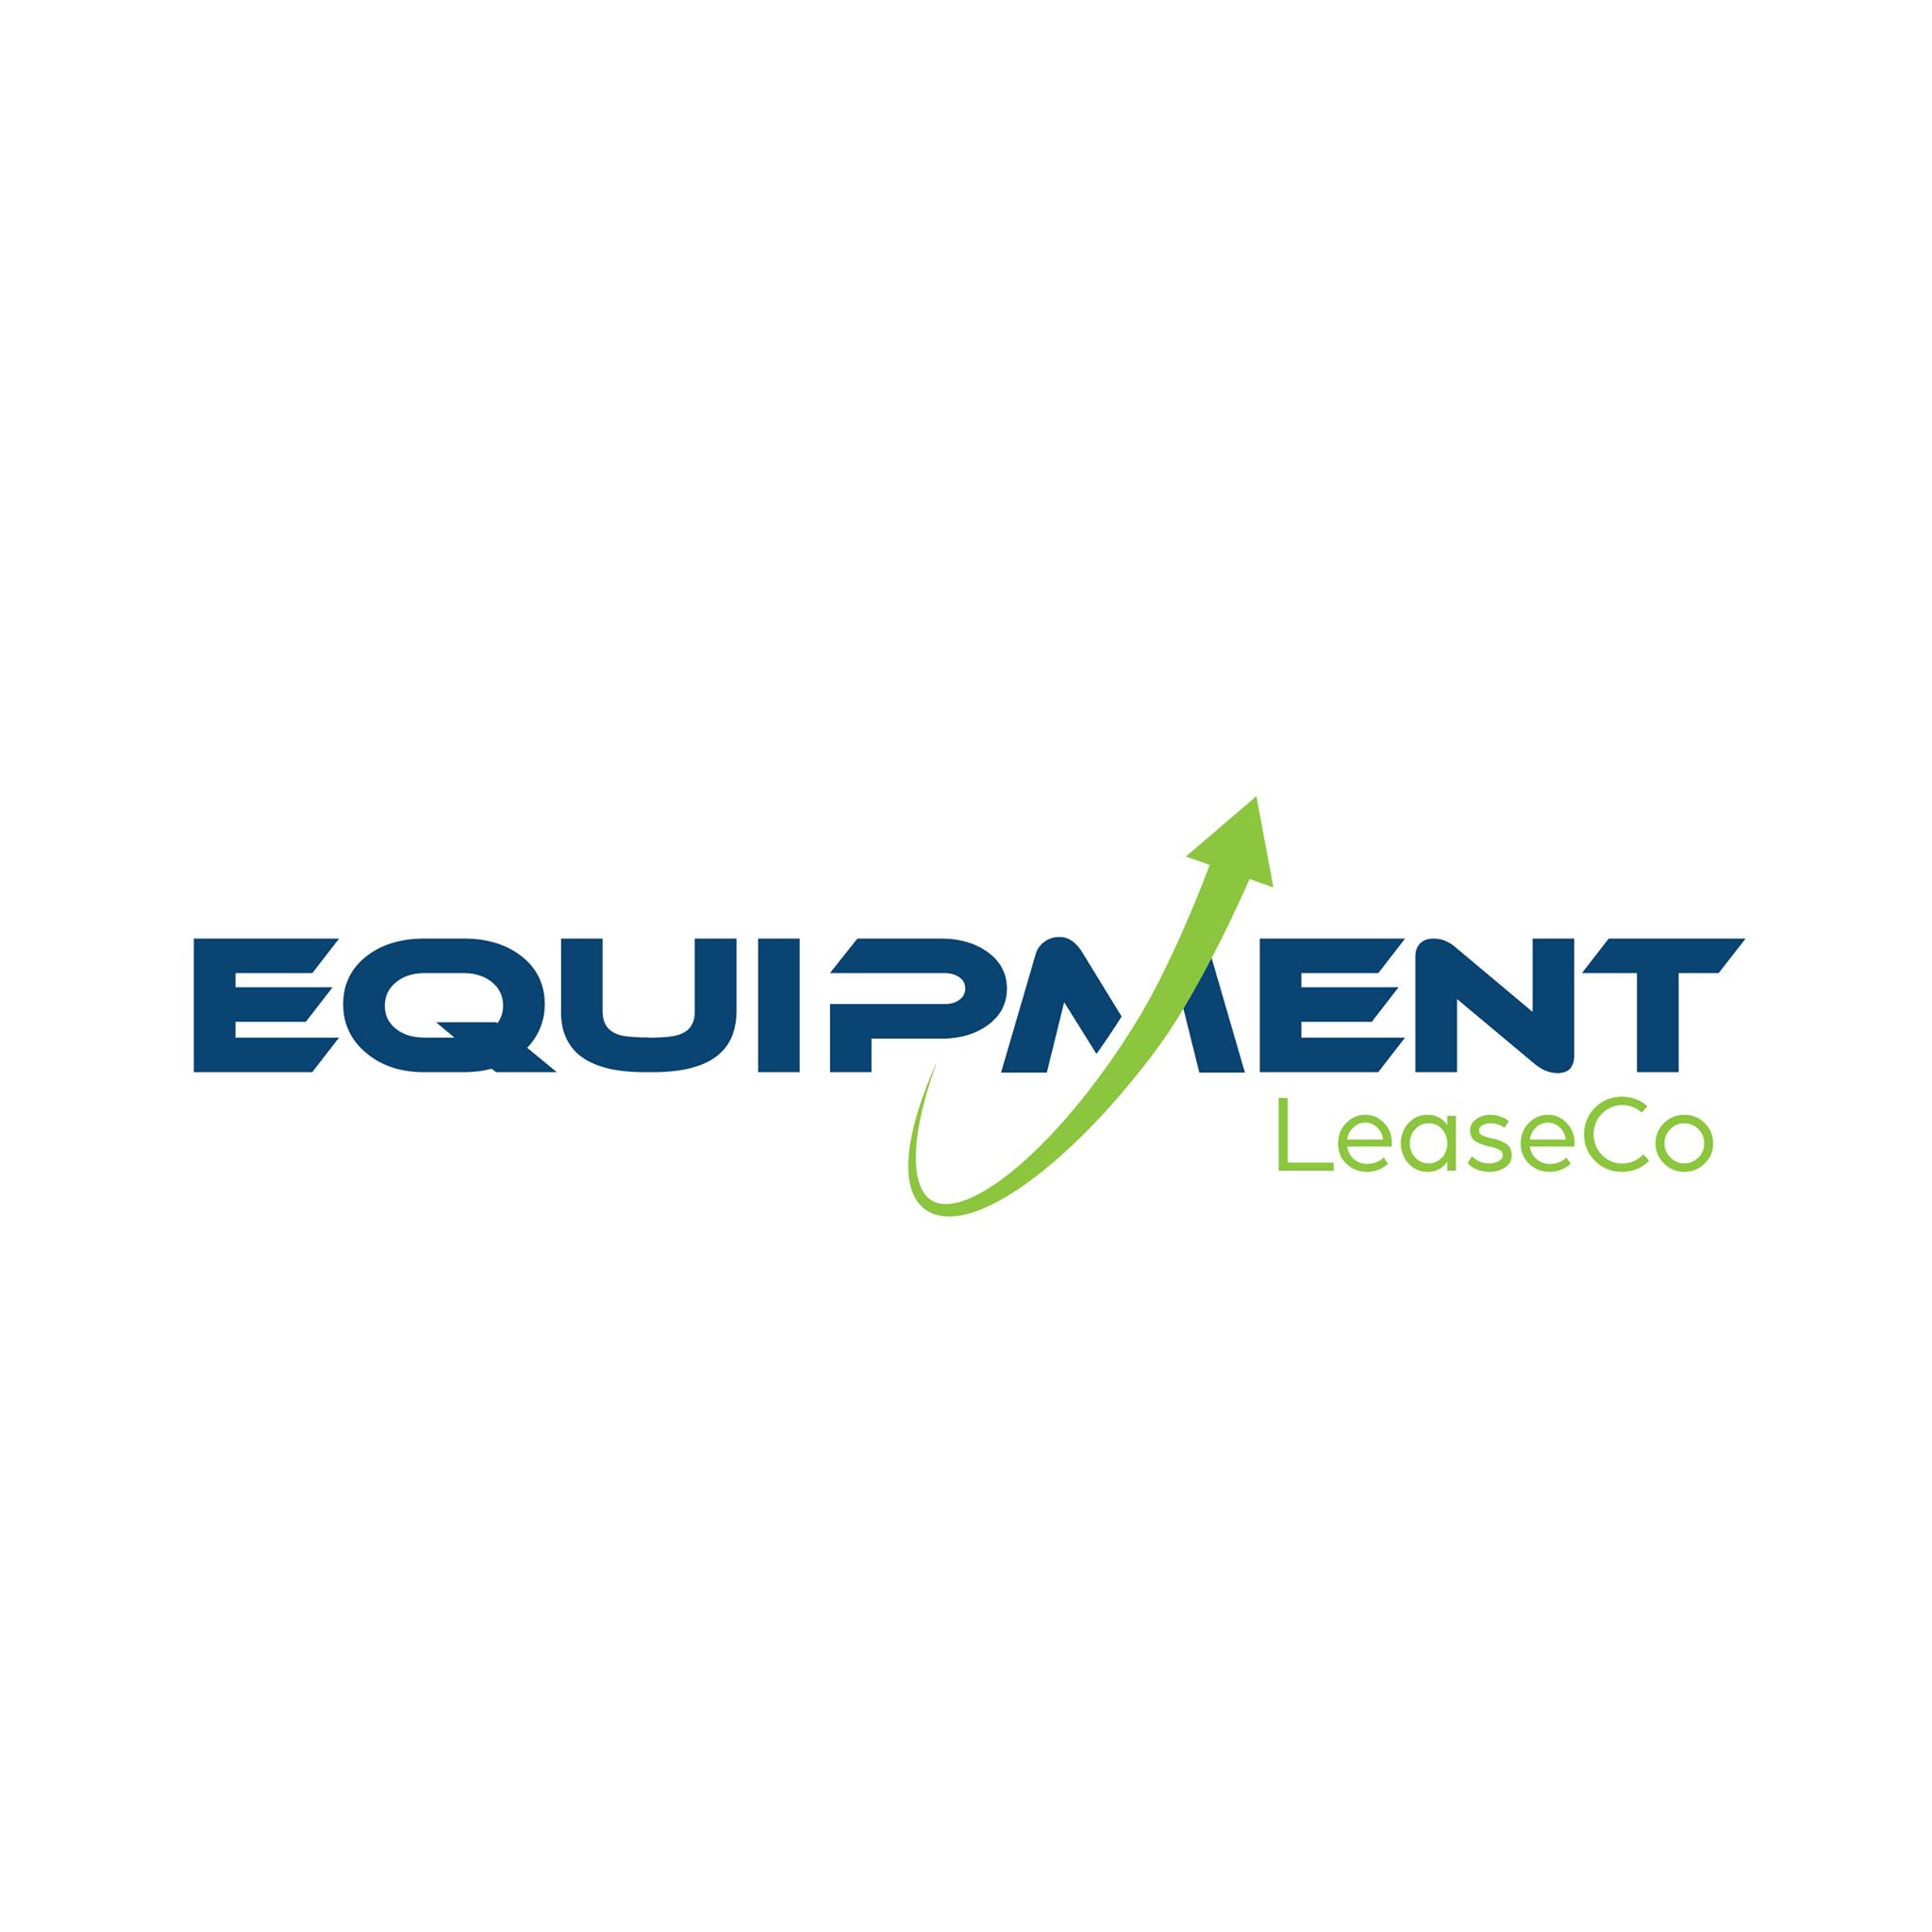 Equipment LeaseCo Inc - Douglasville, GA 30134 - (404)400-1837 | ShowMeLocal.com